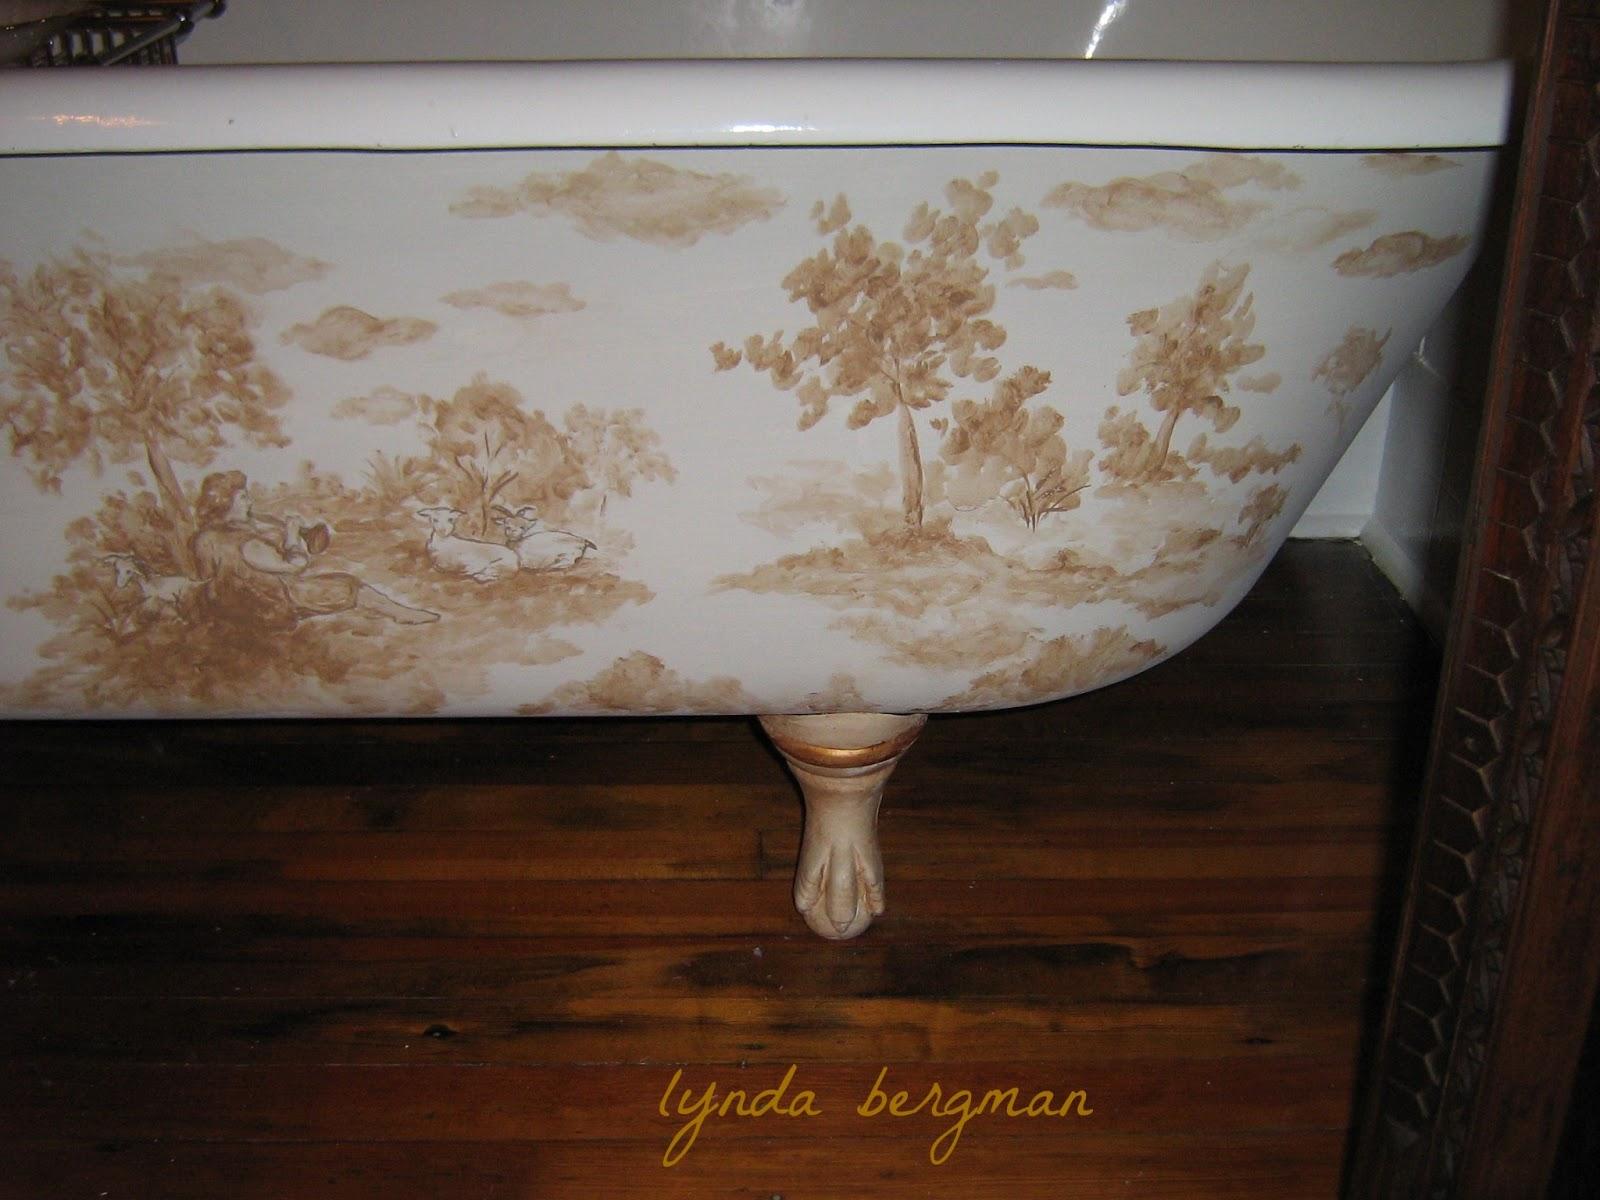 LYNDA BERGMAN DECORATIVE ARTISAN: HAND PAINTED \